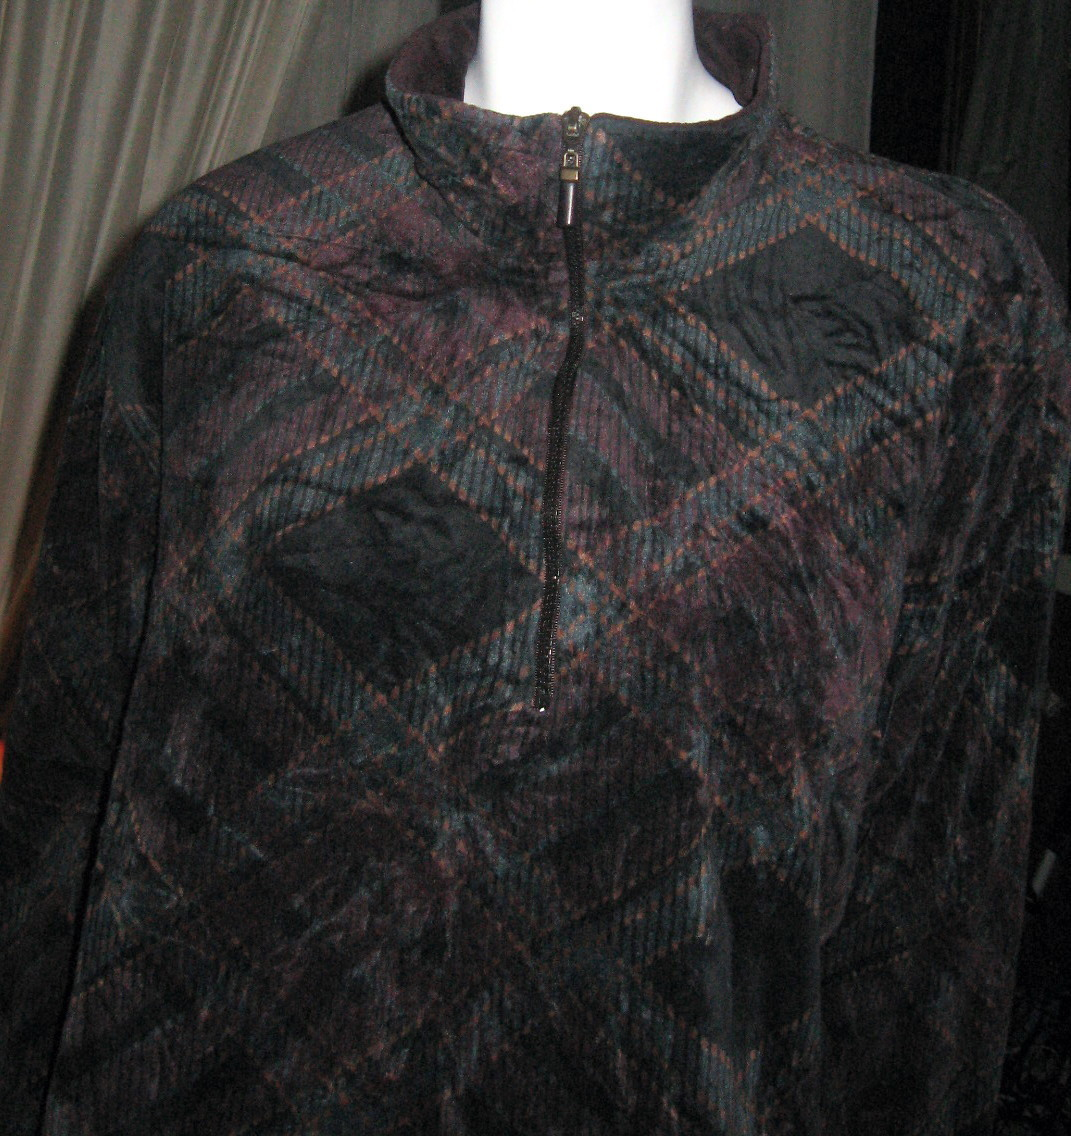 Women's Capacity Plus Size 1X Tunic, Long Sleeves, Velour 2 Way Zip Neckline